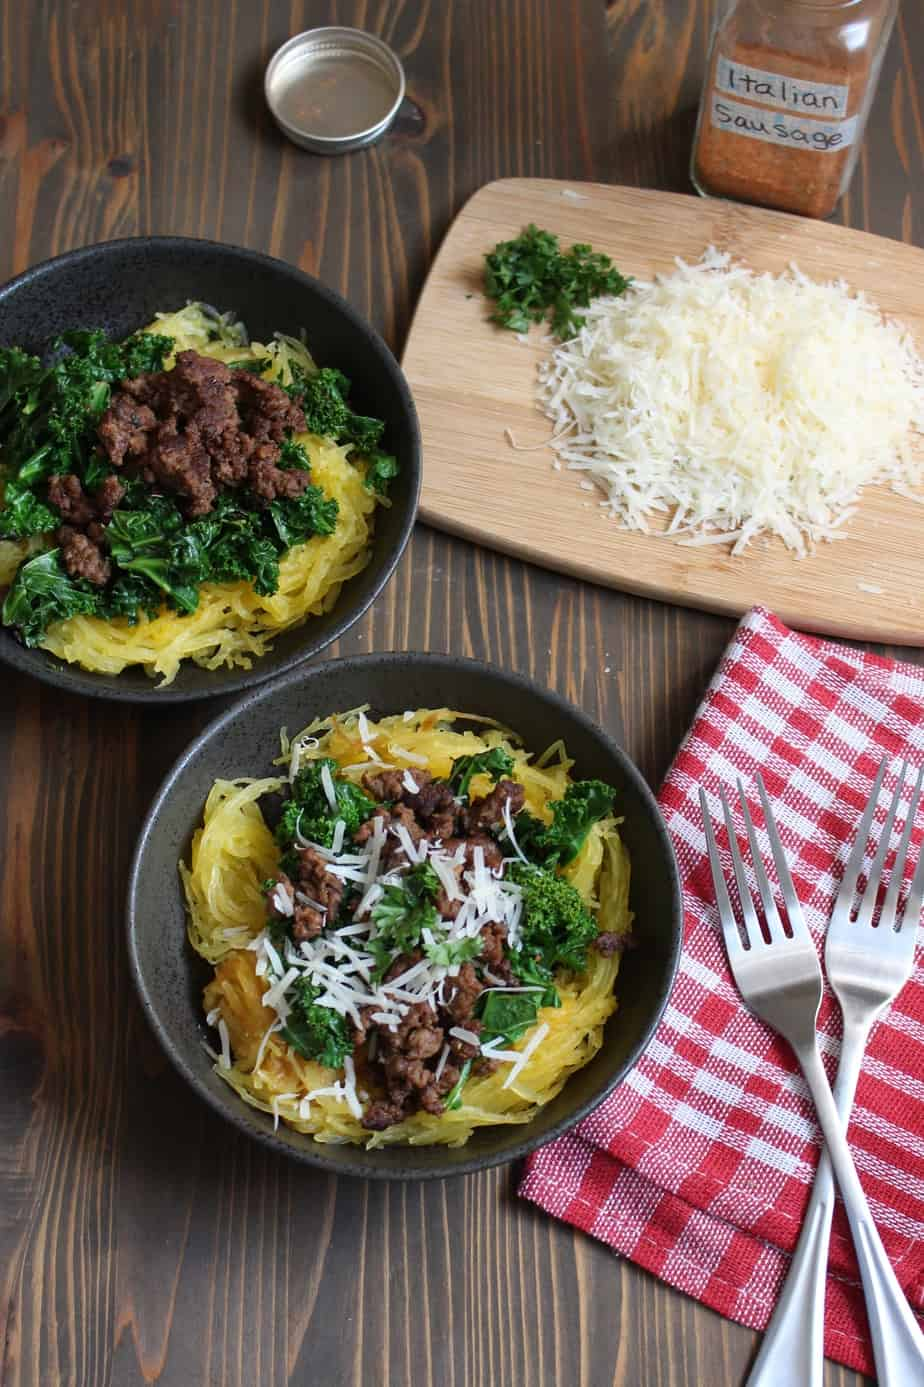 Easy Paleo Spaghetti Squash Bowl | Frugal Nutrition